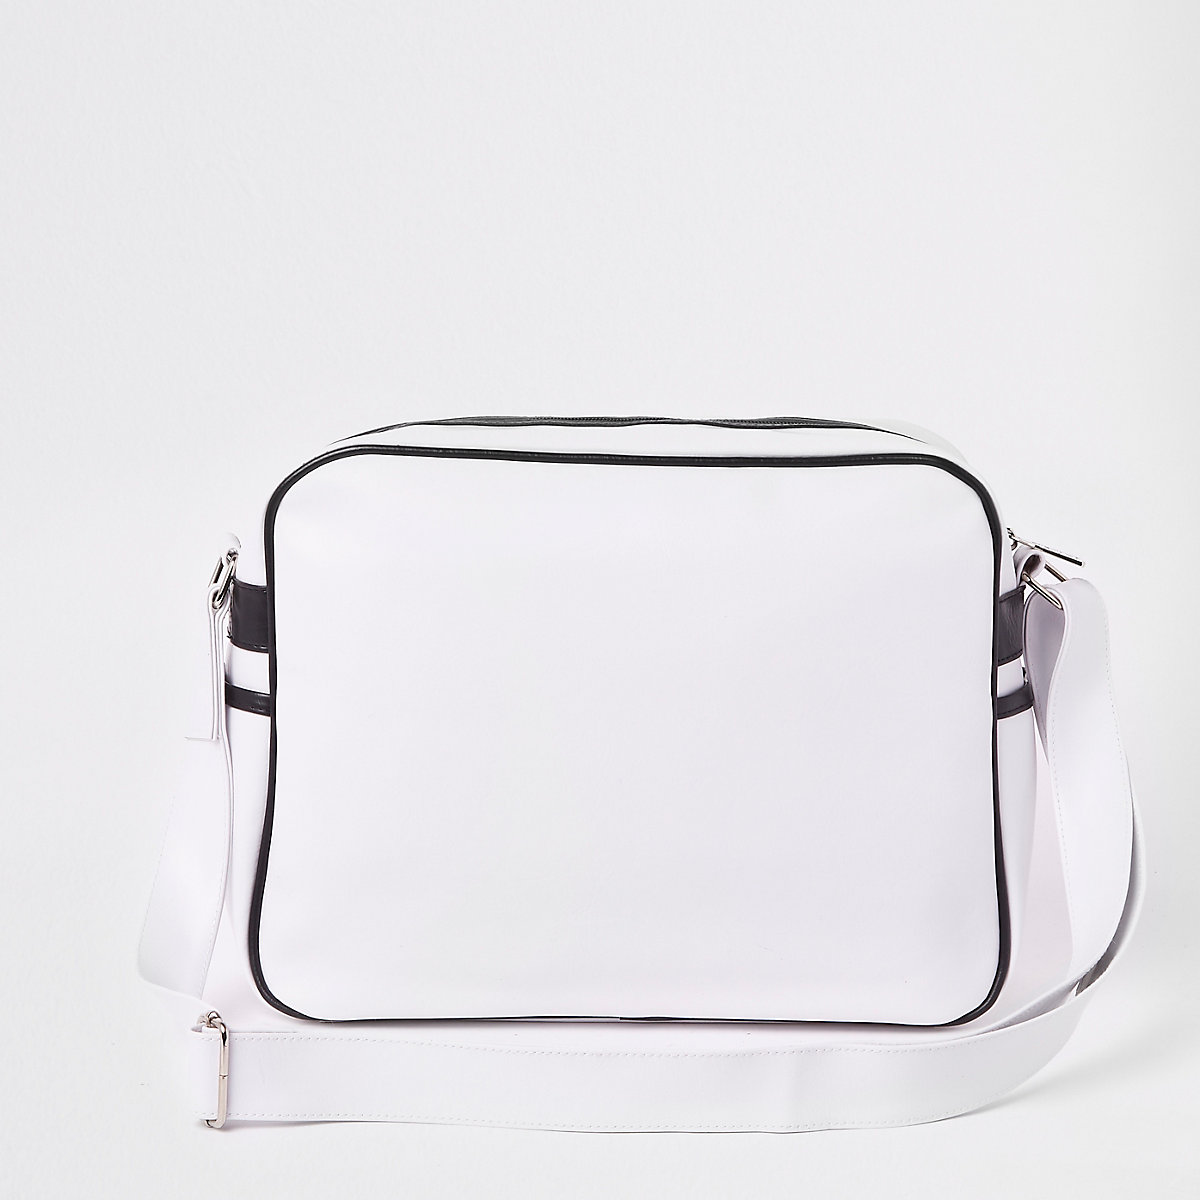 cc36c835c67a Girls metallic purple Gola backpack - Backpacks - Bags   Purses - girls